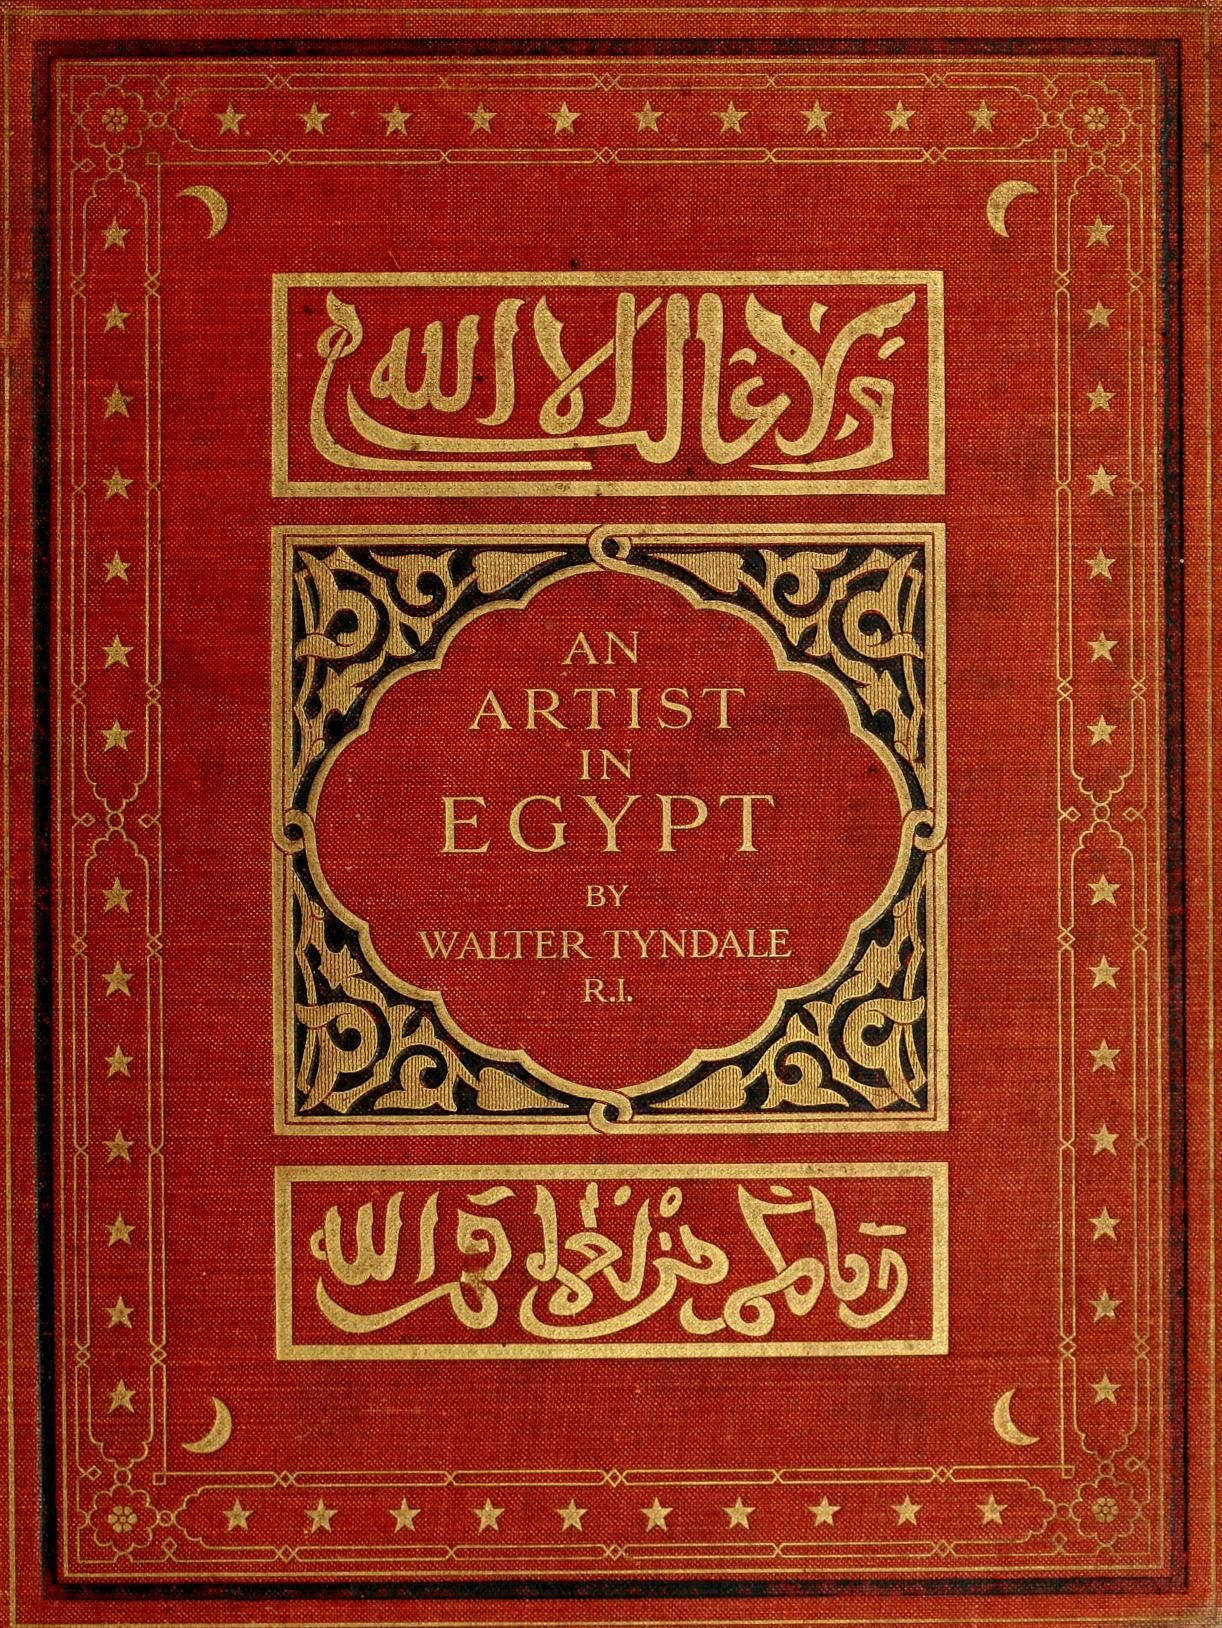 'An artist in Egypt'  by Walter Tyndale. Hodder & Stoughton; London,  New York, 1912